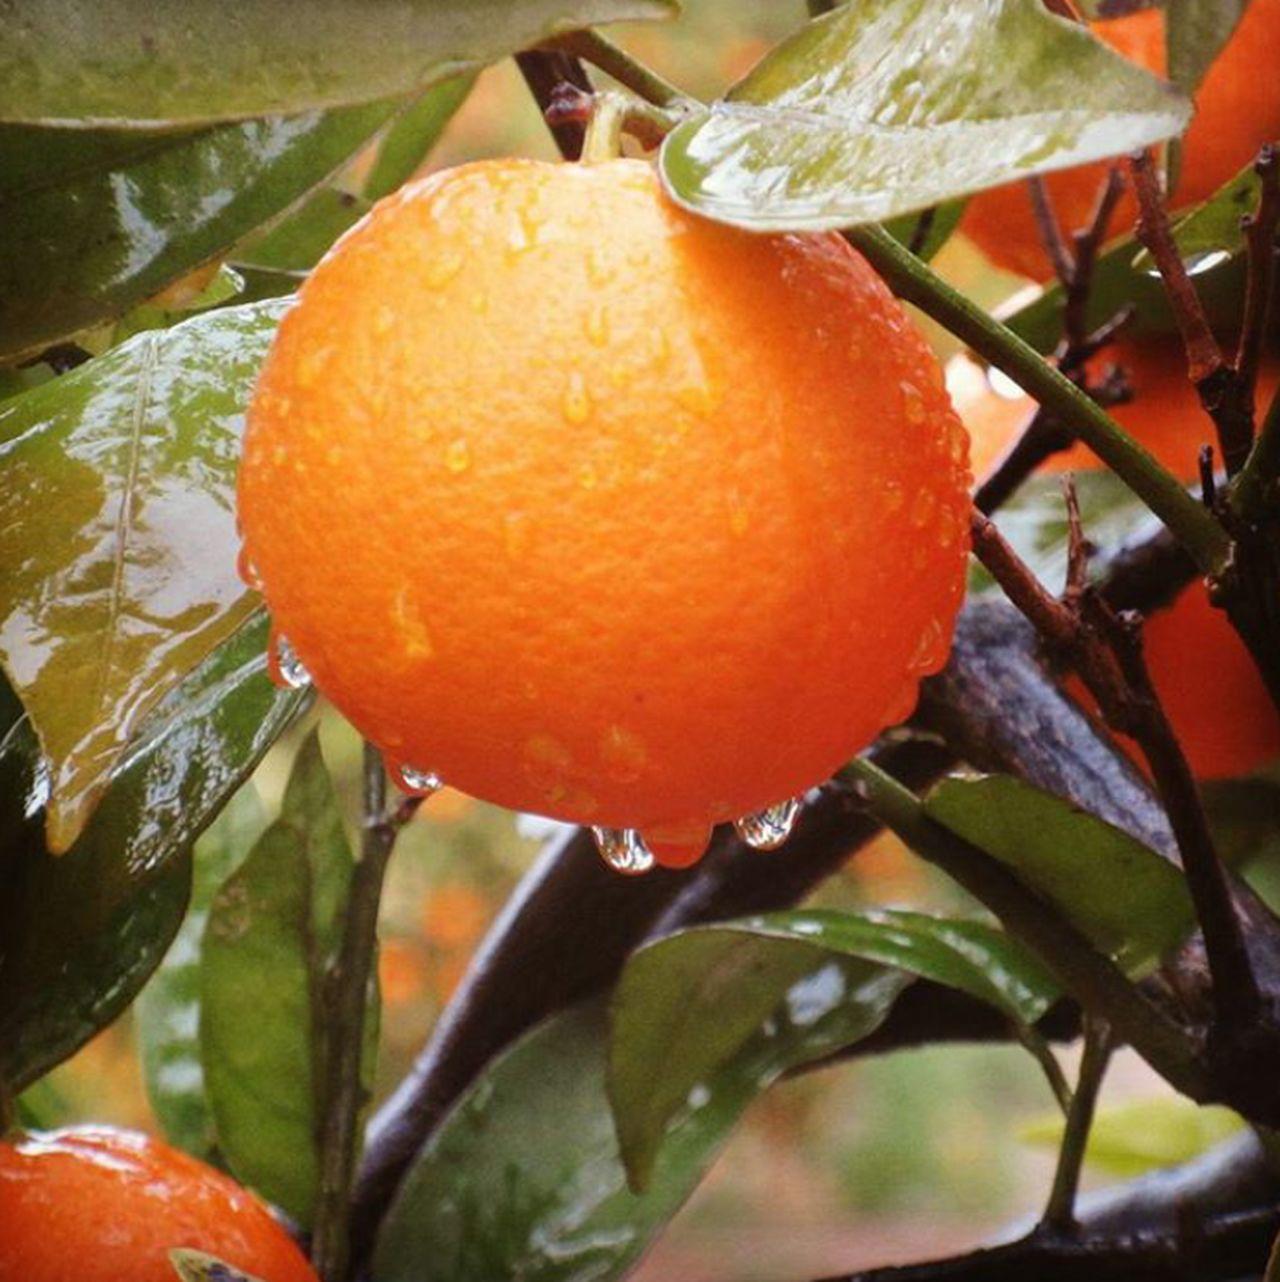 Pluja Taronja Citrus Fruit Orange - Fruit Fruit Orange Color No People Beauty In Nature Naranja Lluvia Lluvia Gotas Lluvia. 📷 València Valencia, Spain Valencianature Passeigsotalapluja